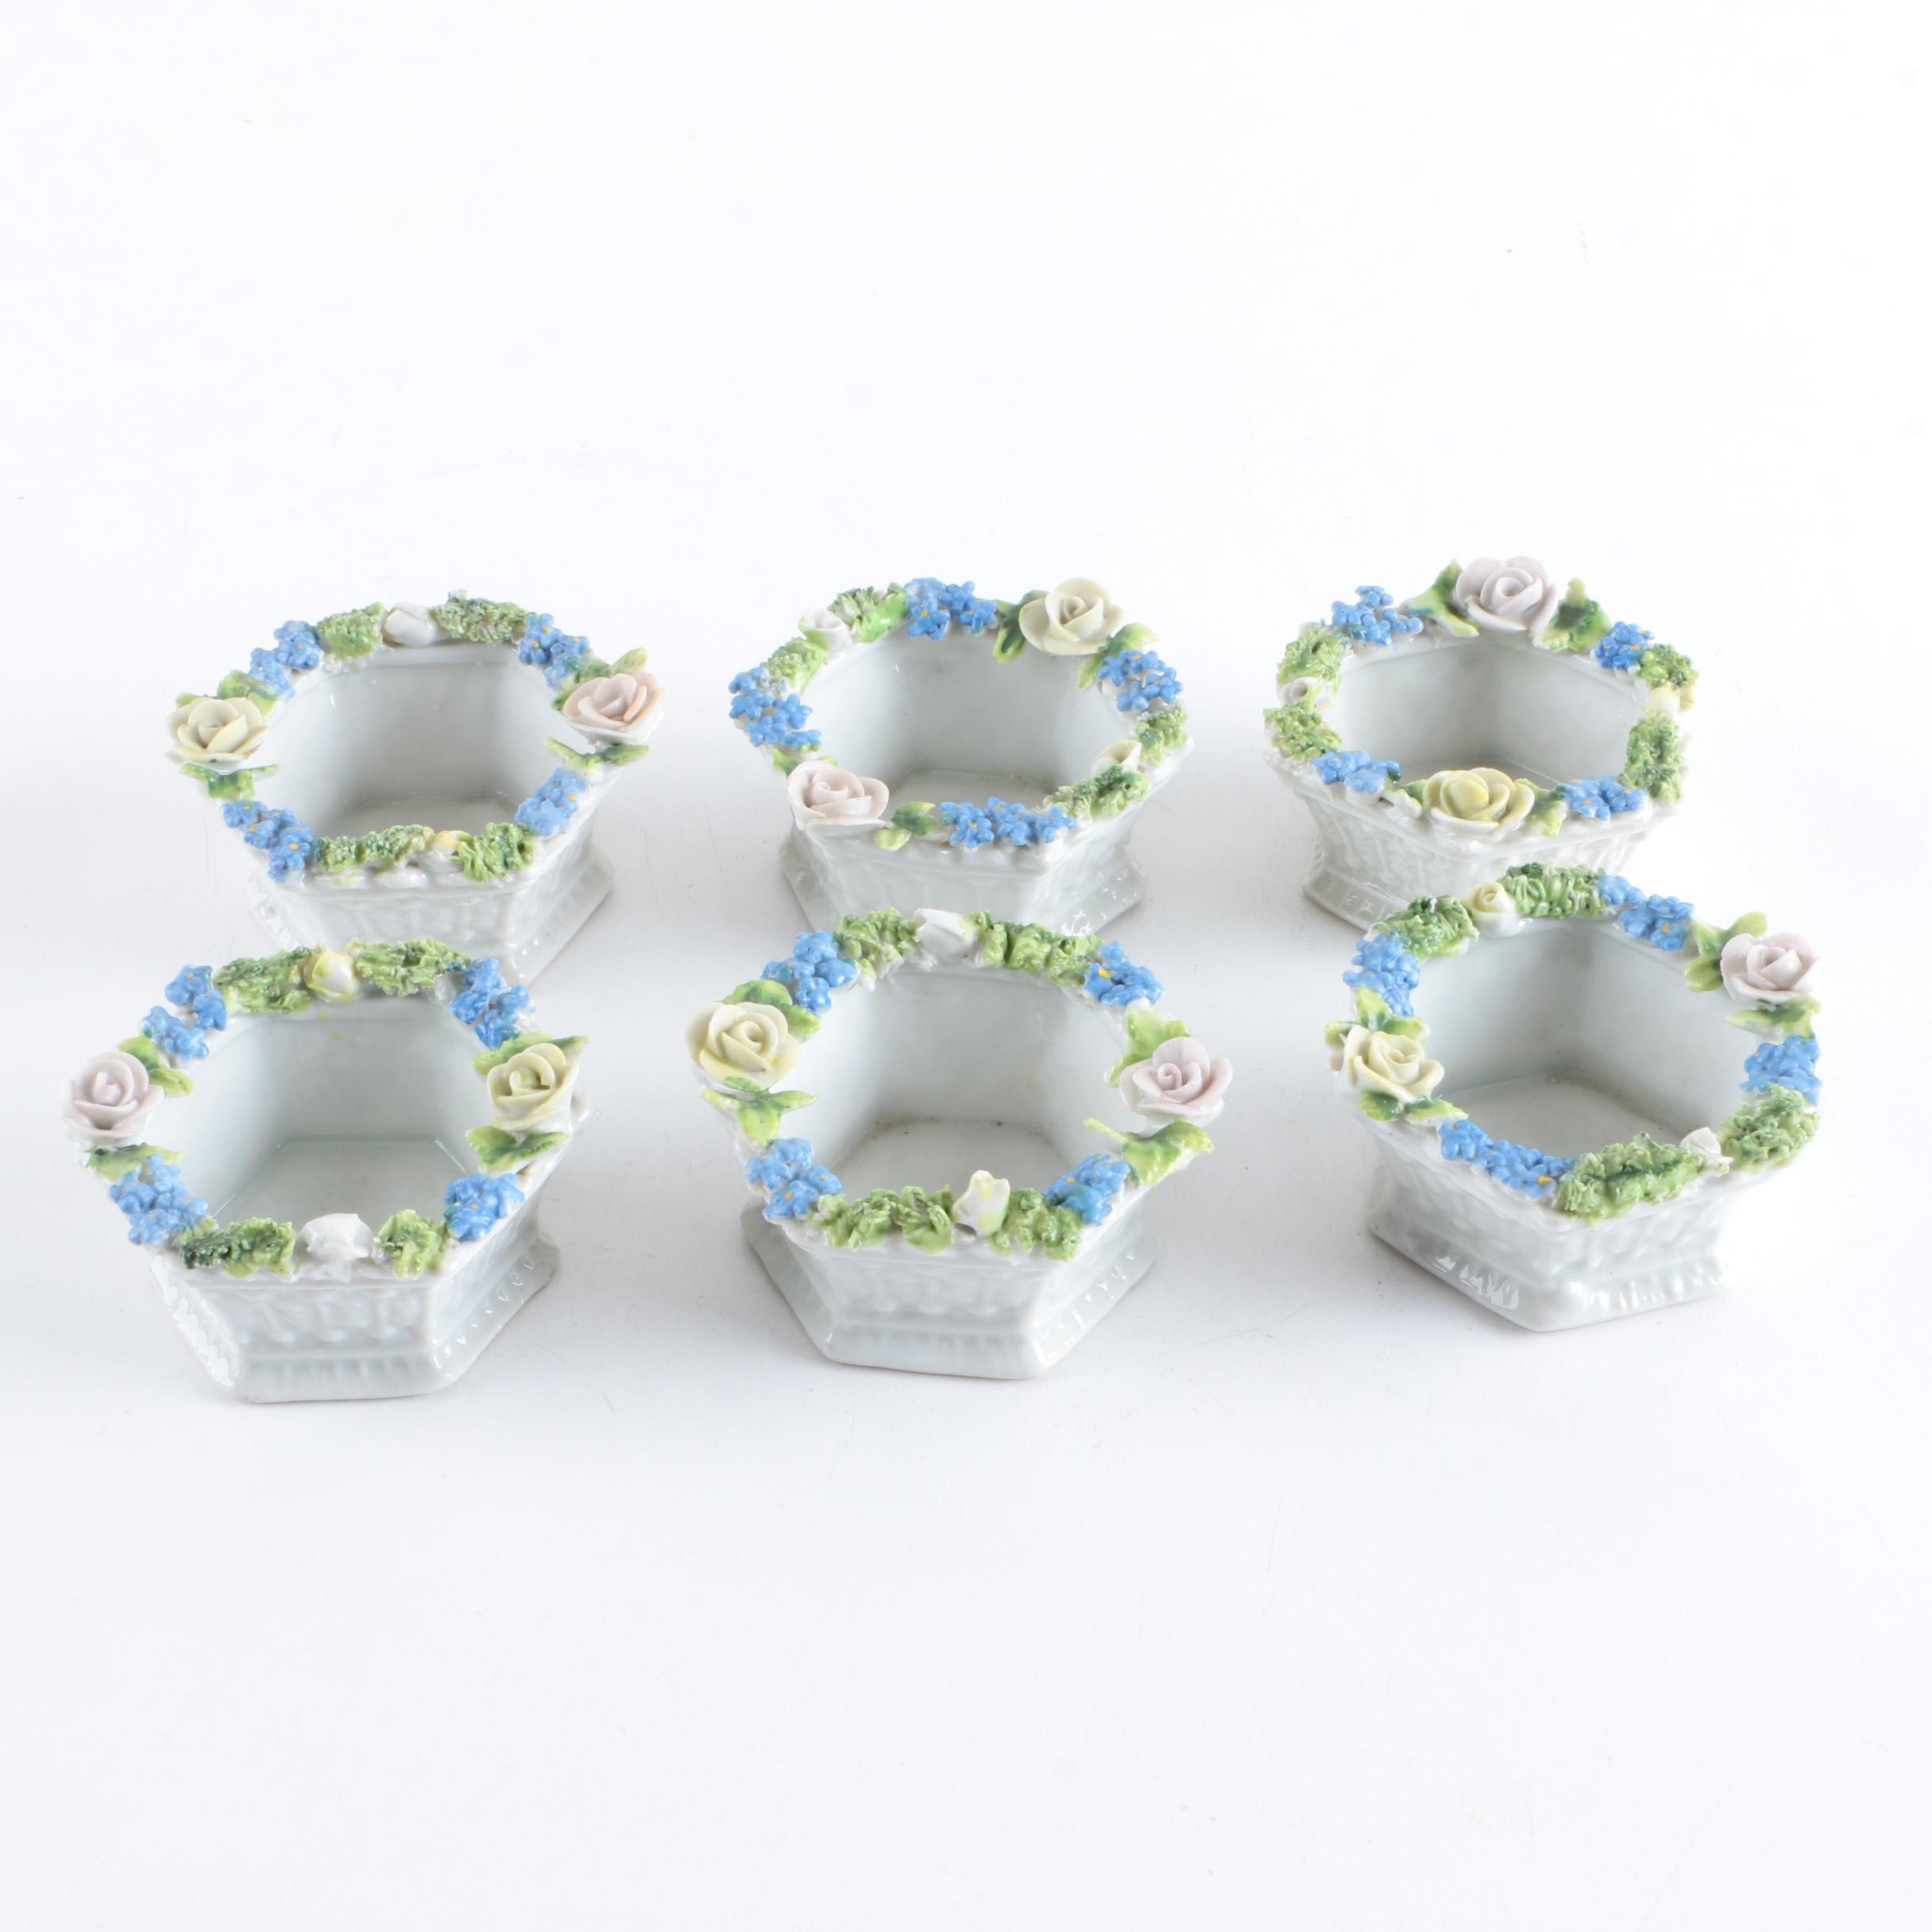 Elfinware Porcelain Salt Cellars